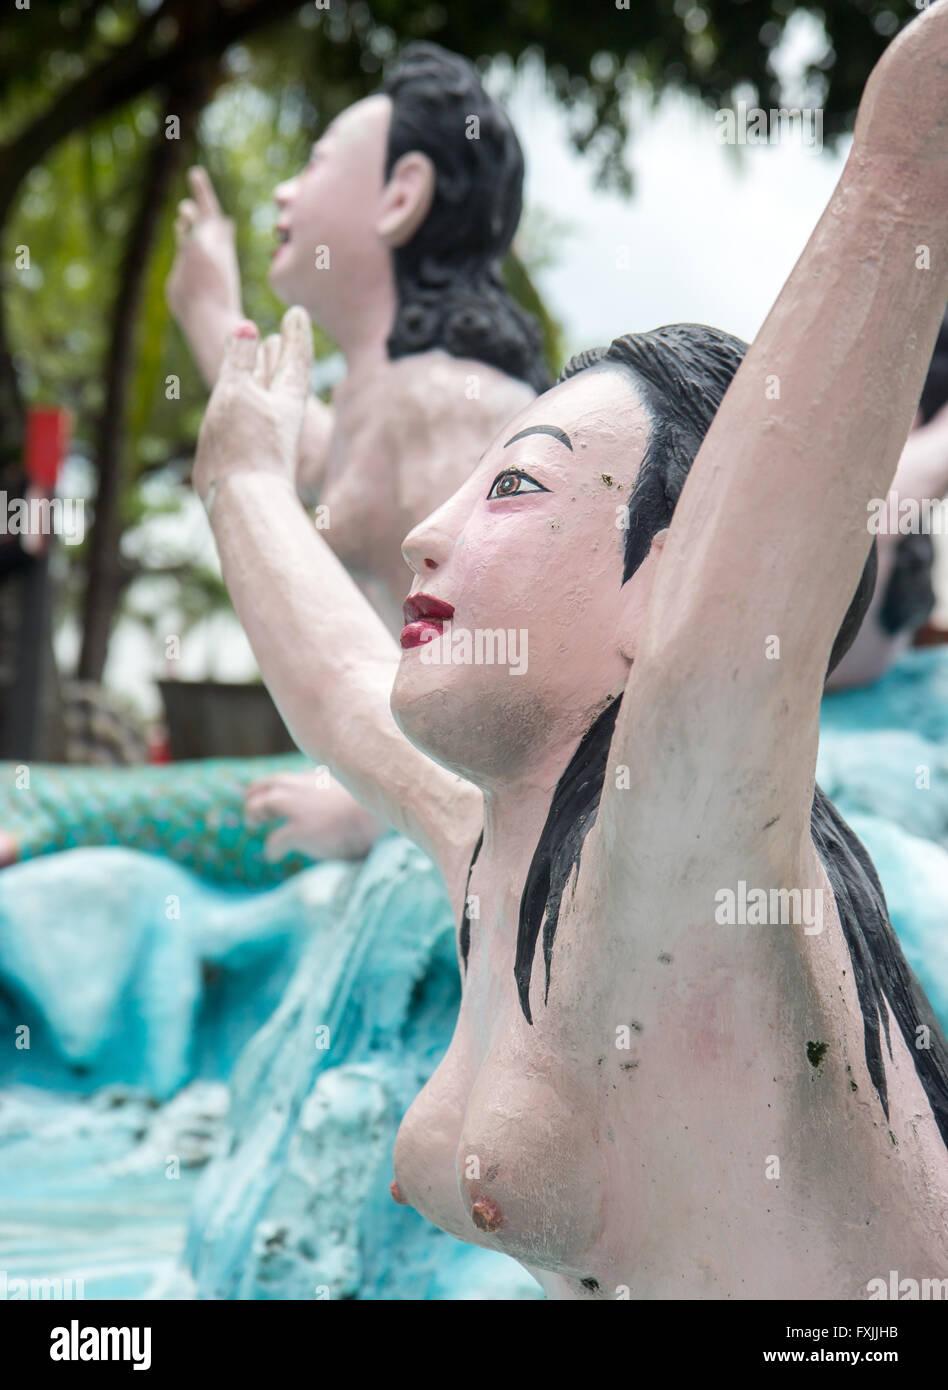 statues of mermaid (siren) - Stock Image